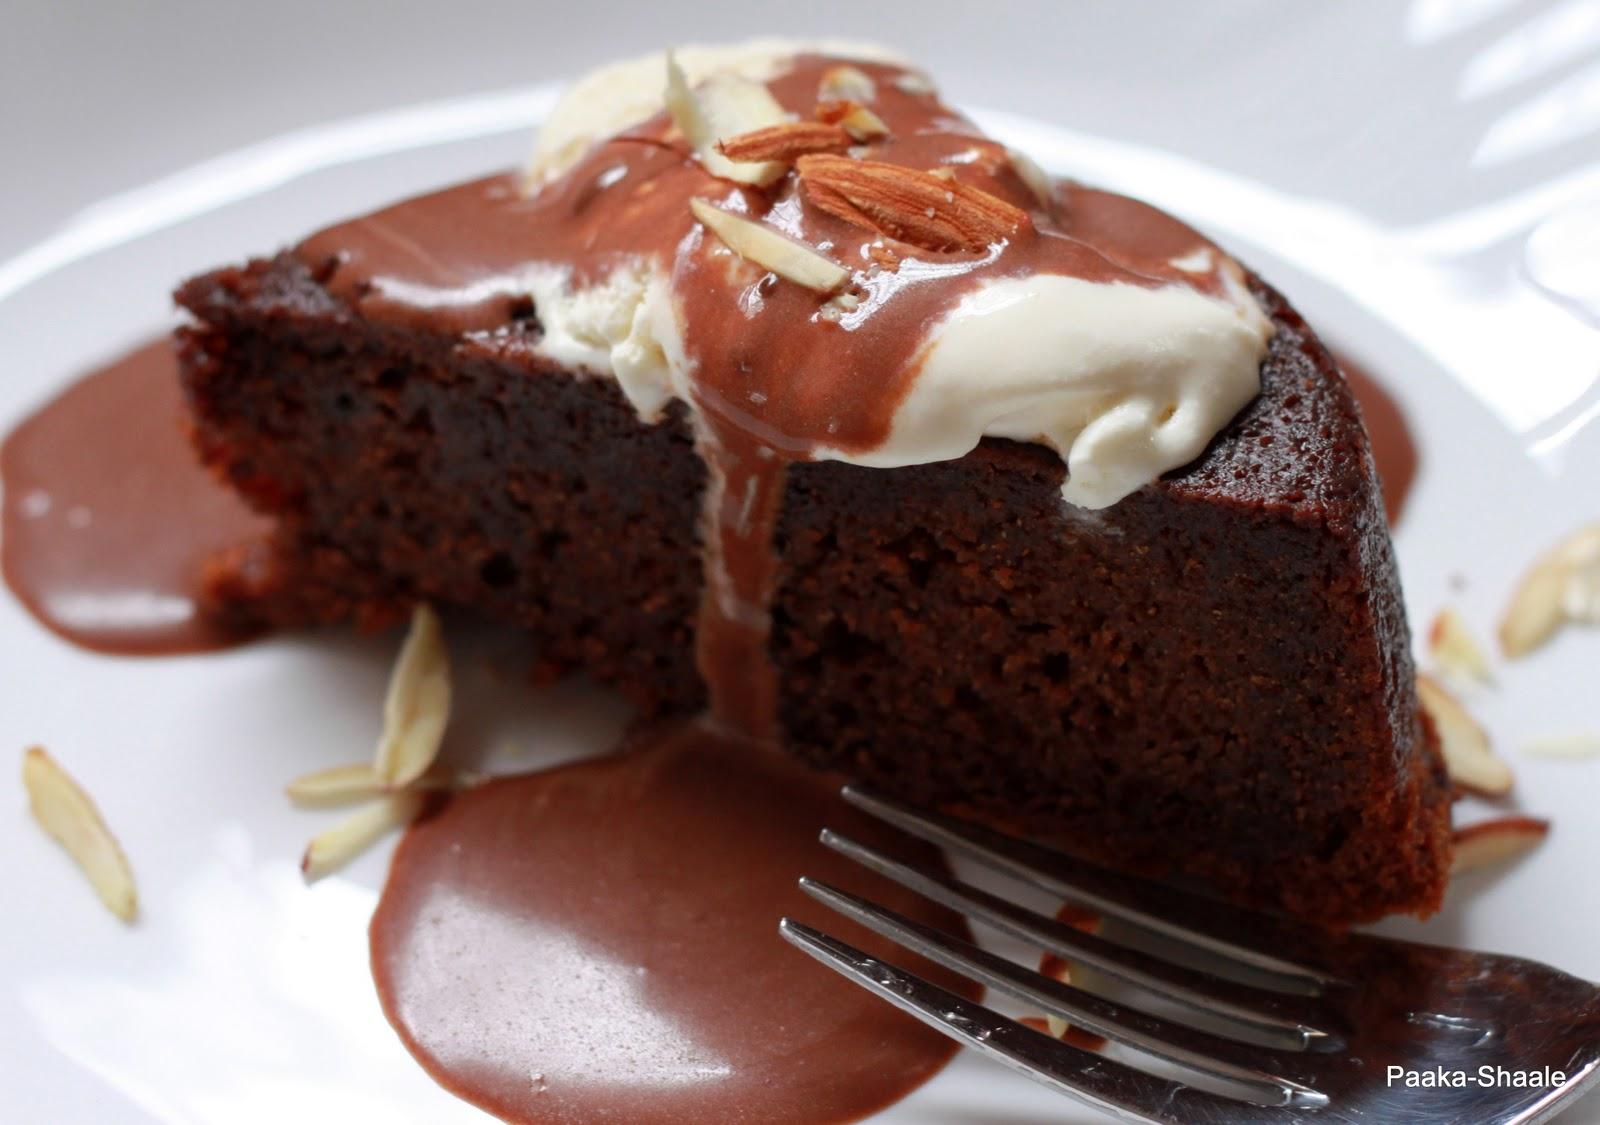 Paaka-Shaale: Molten chocolate cake